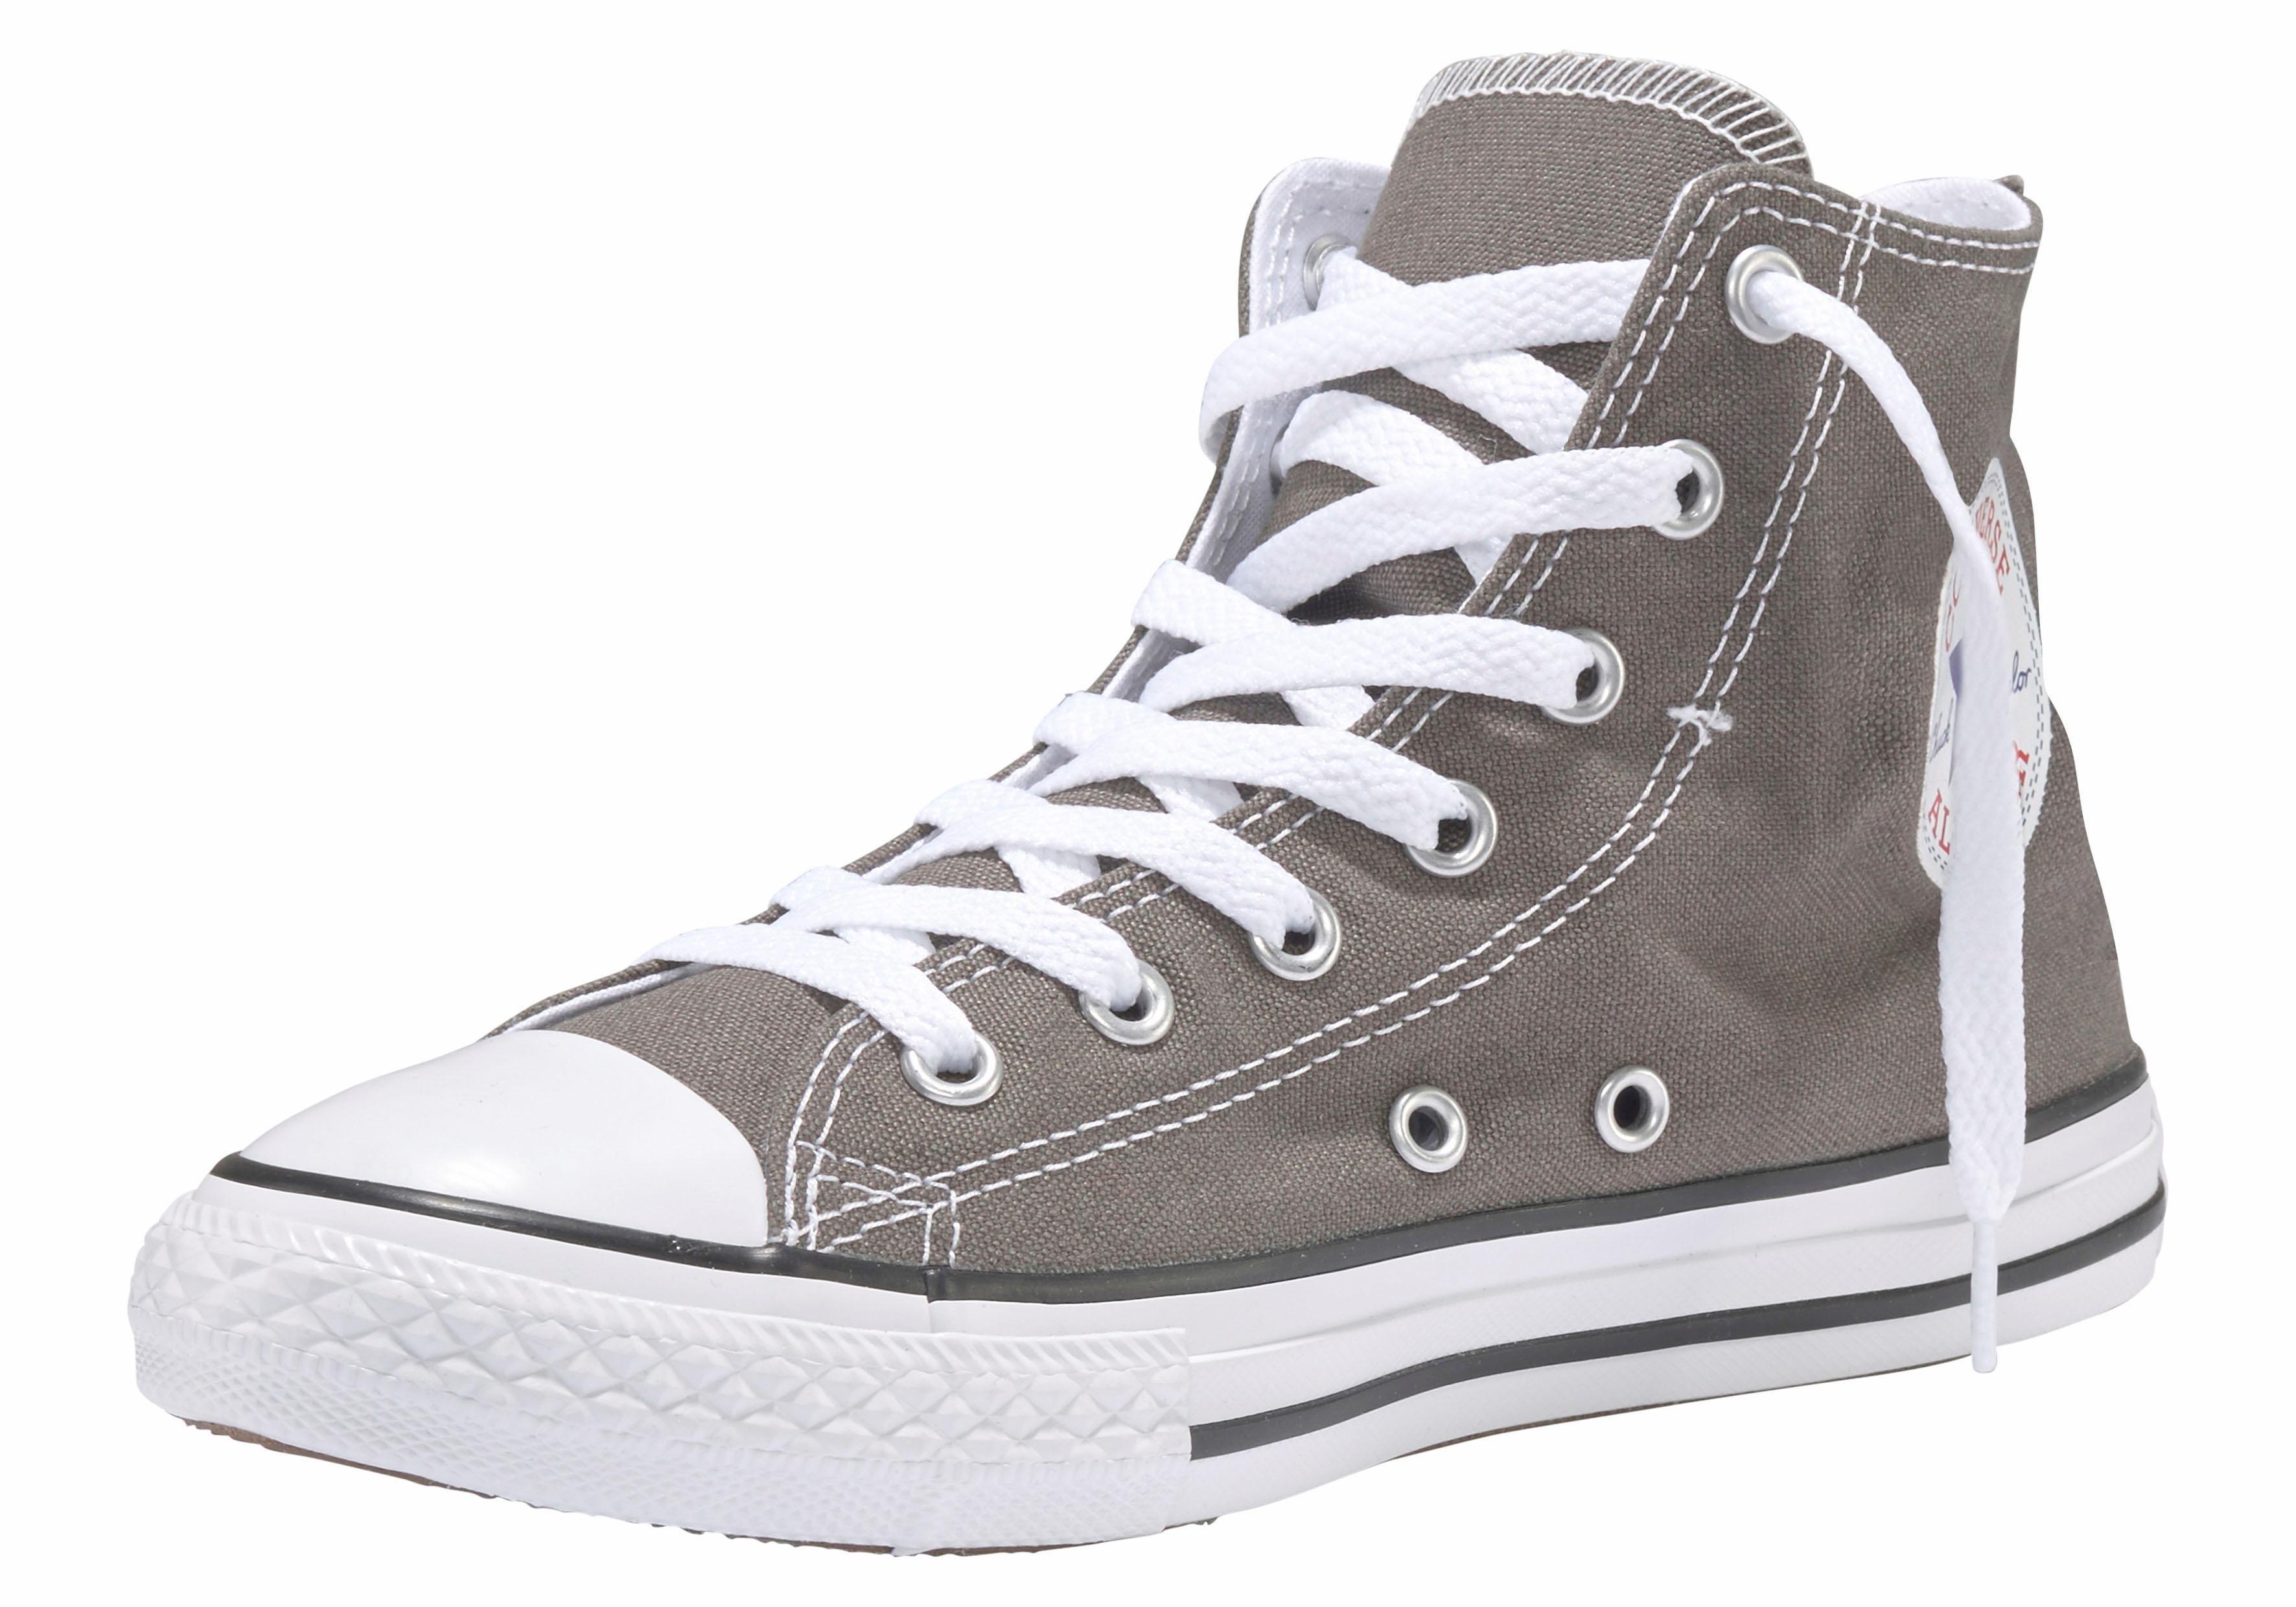 7e96a6b0ac4 ... CONVERSE Sneakers in plat model, NIKE sneakers »Air Max Command Flex«,  JACK WOLFSKIN Outdoorschoenen All Terrain, adidas Performance  trainingsschoenen » ...